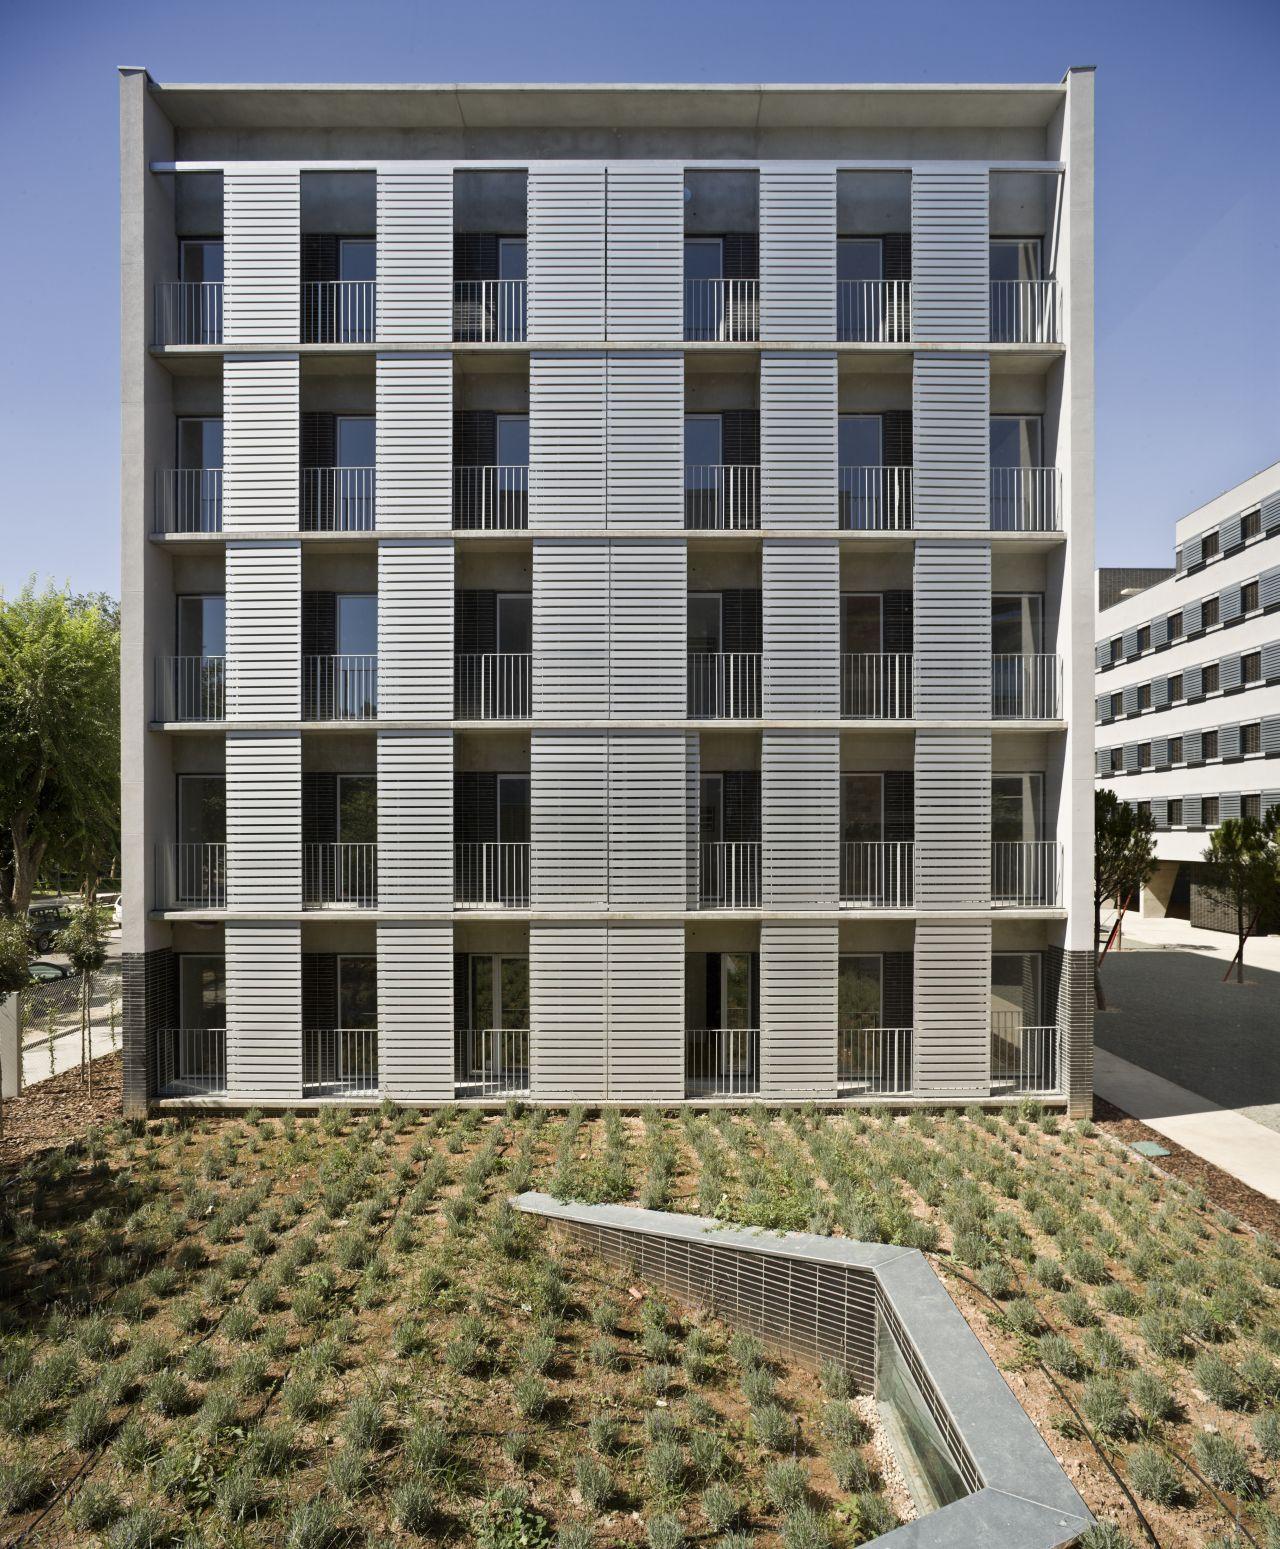 Galeria de conjunto habitacional em albacete burgos garrido arquitectos 6 - Arquitectos albacete ...